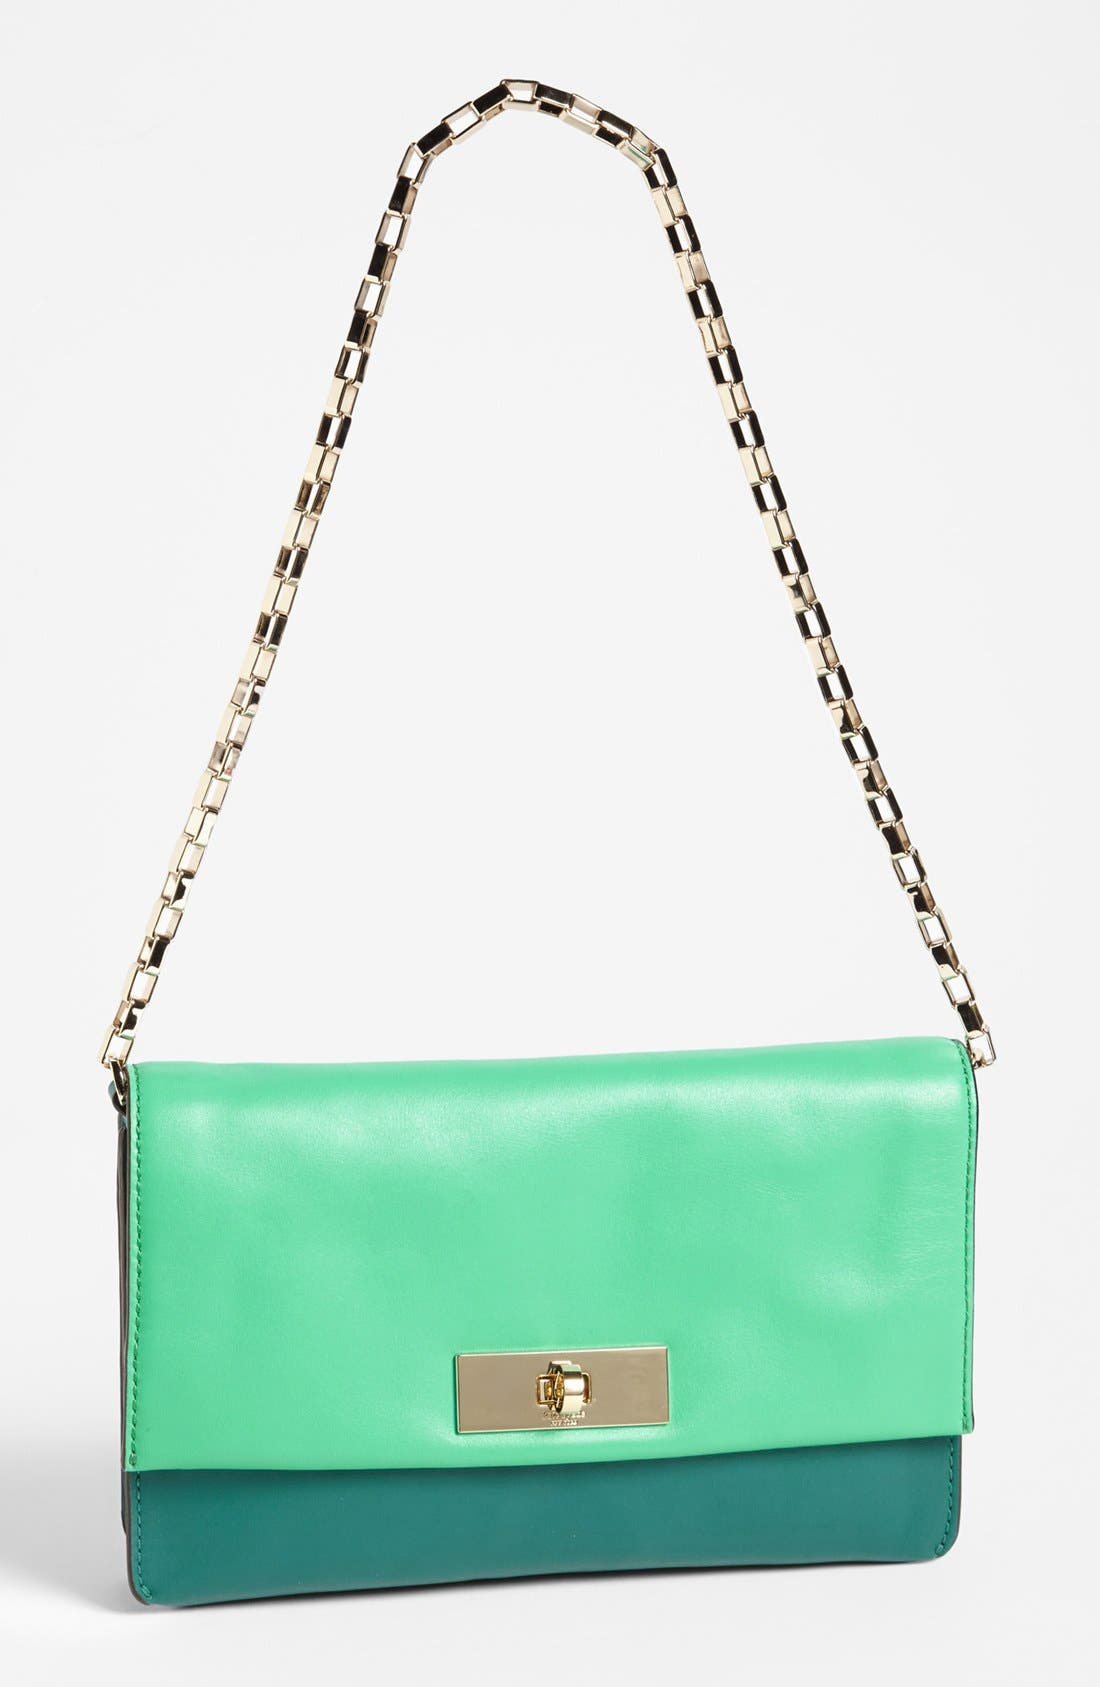 Main Image - kate spade new york 'lincoln square - garrett' shoulder bag